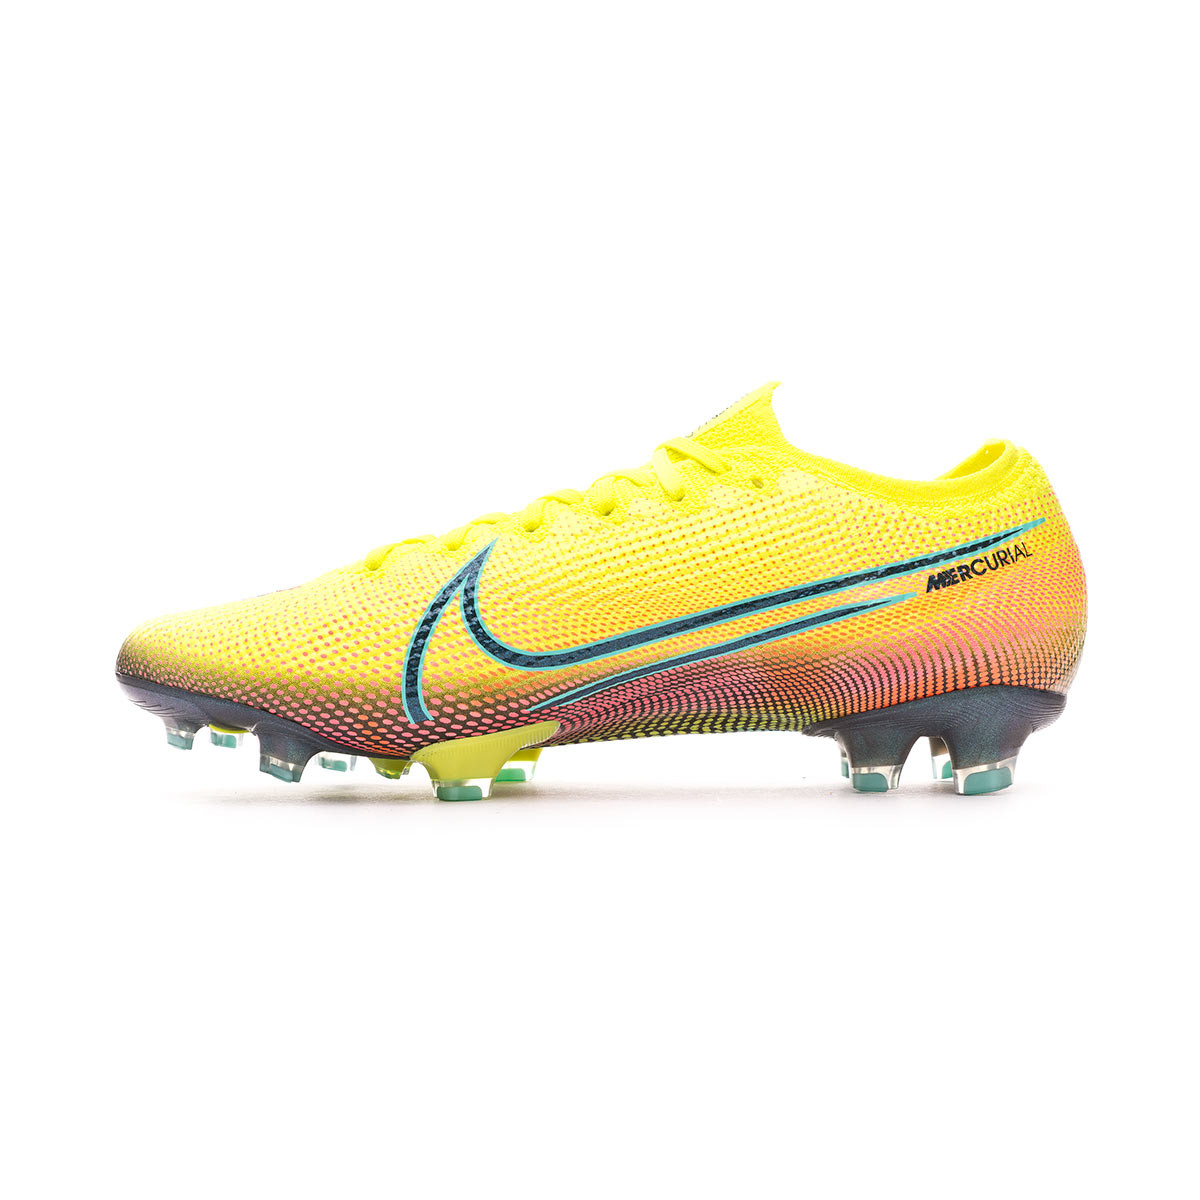 Chaussure de foot Nike Mercurial Vapor XIII Elite MDS 2 FG